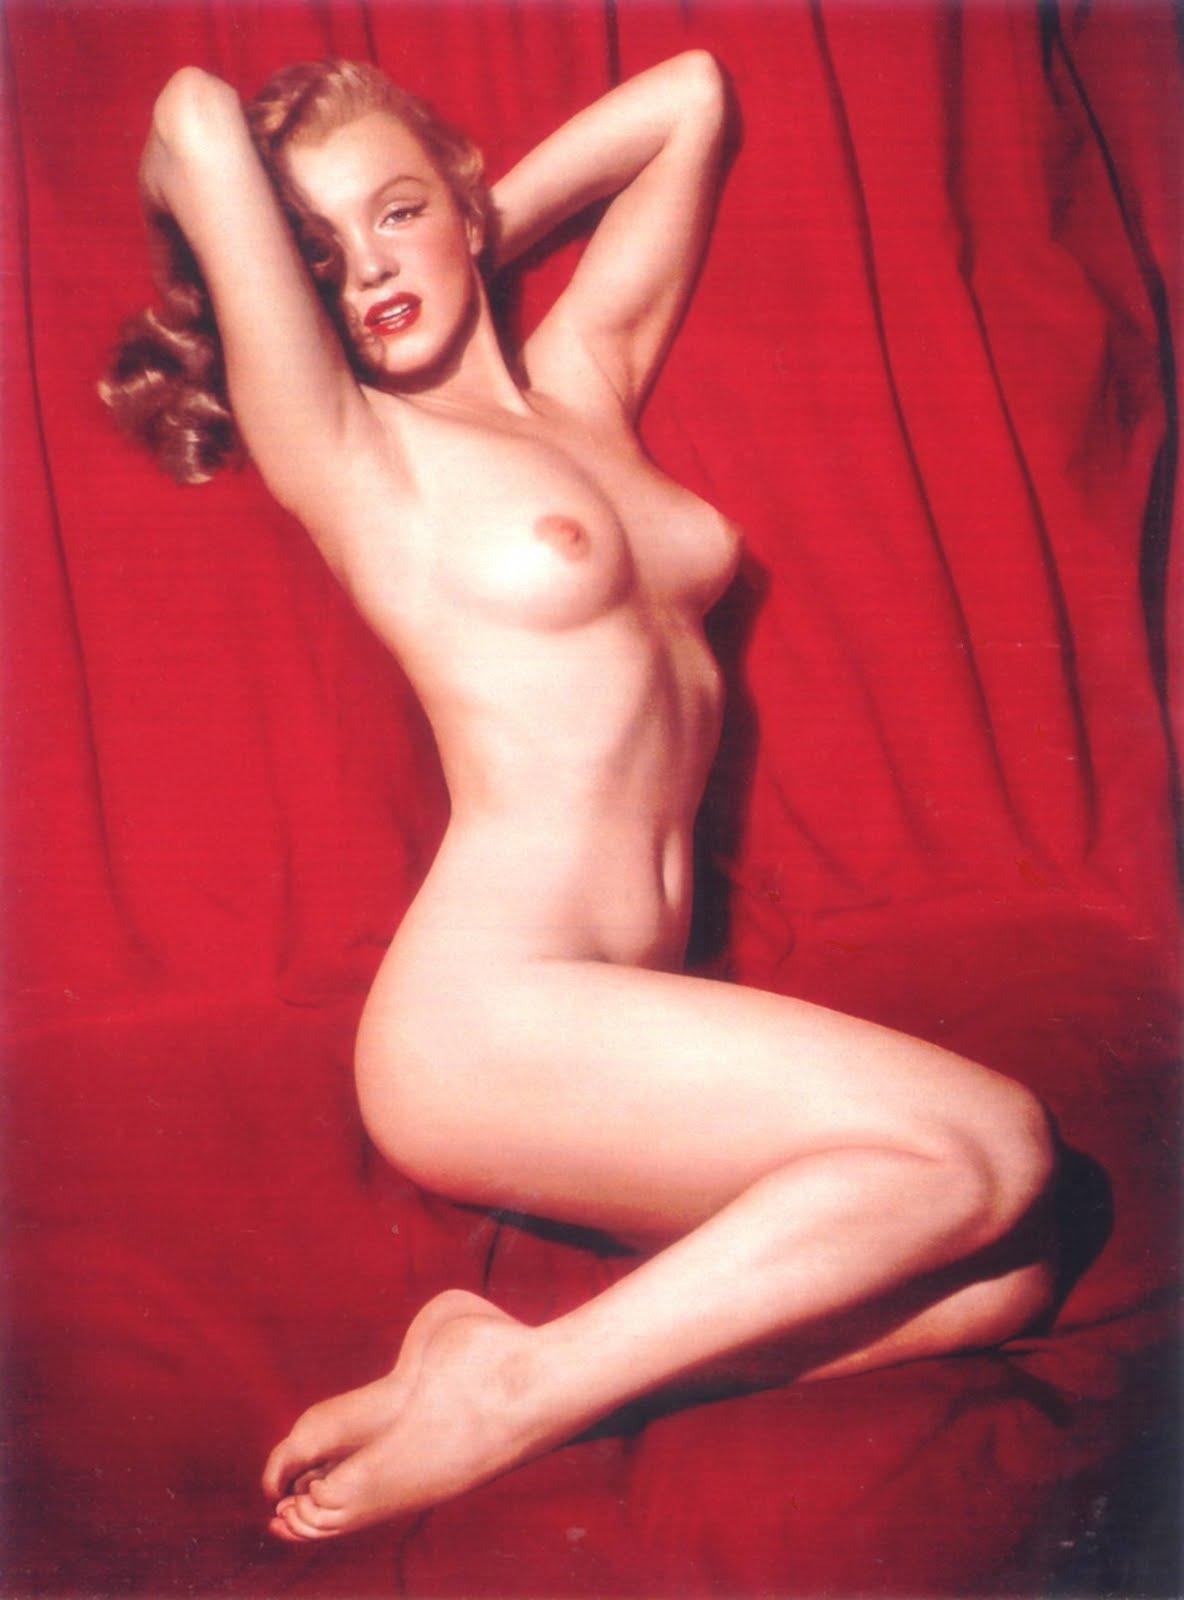 Marilyn lindsay lohan